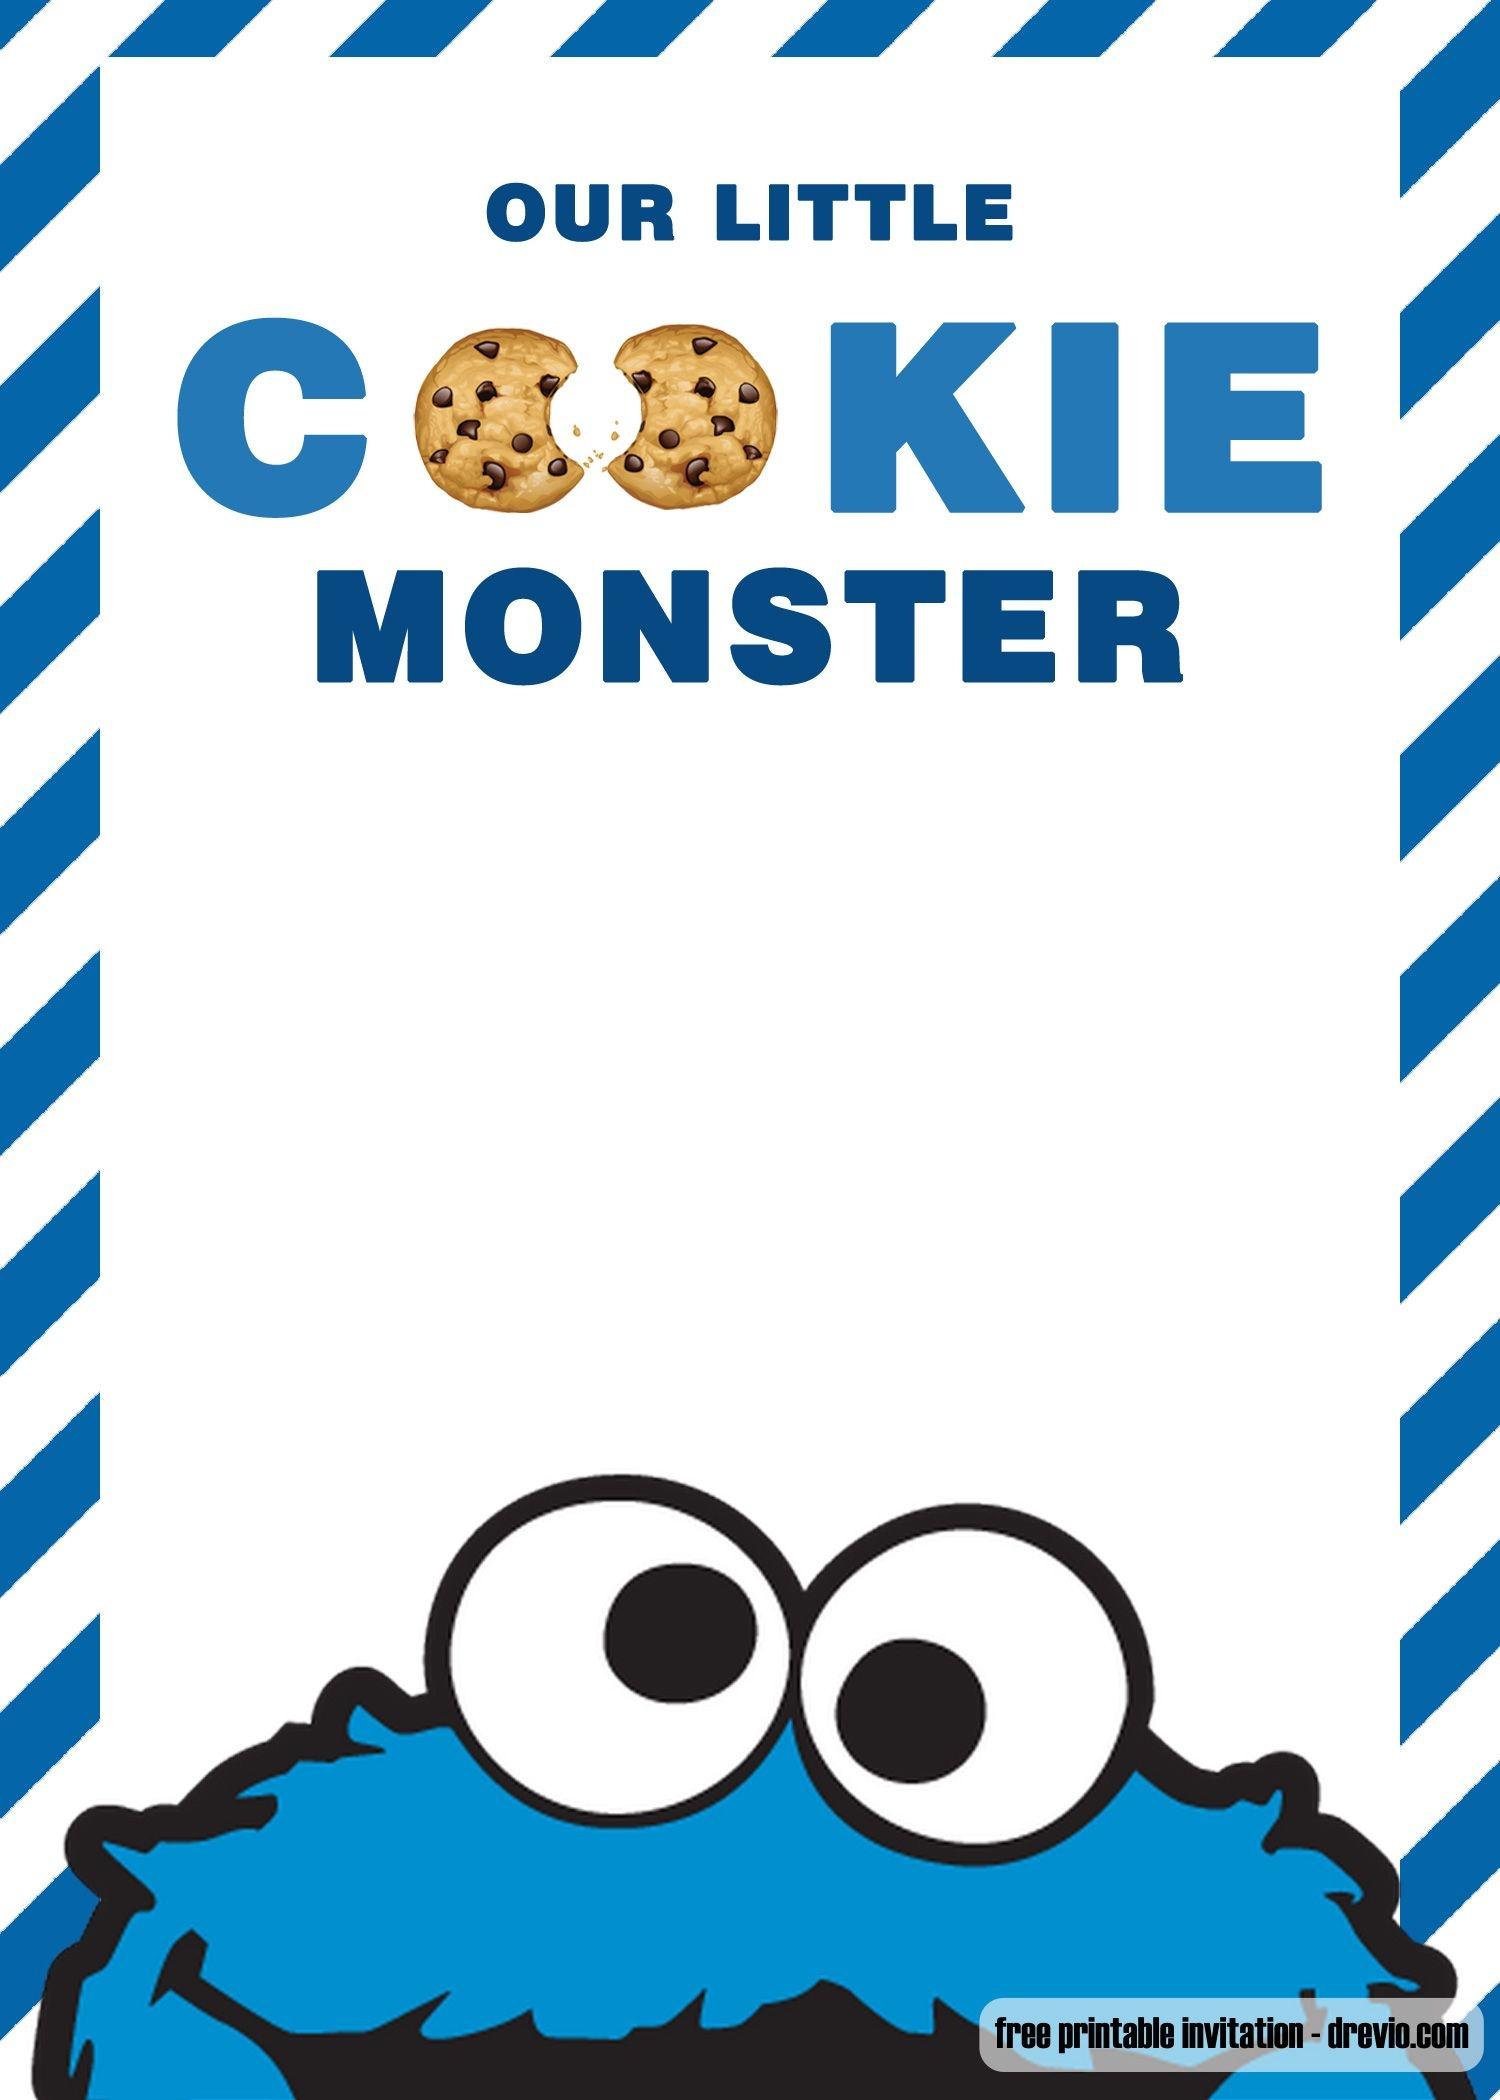 Free Cookie Monster Birthday Invitation Templates | Bagvania - Free Printable Cookie Monster Birthday Invitations